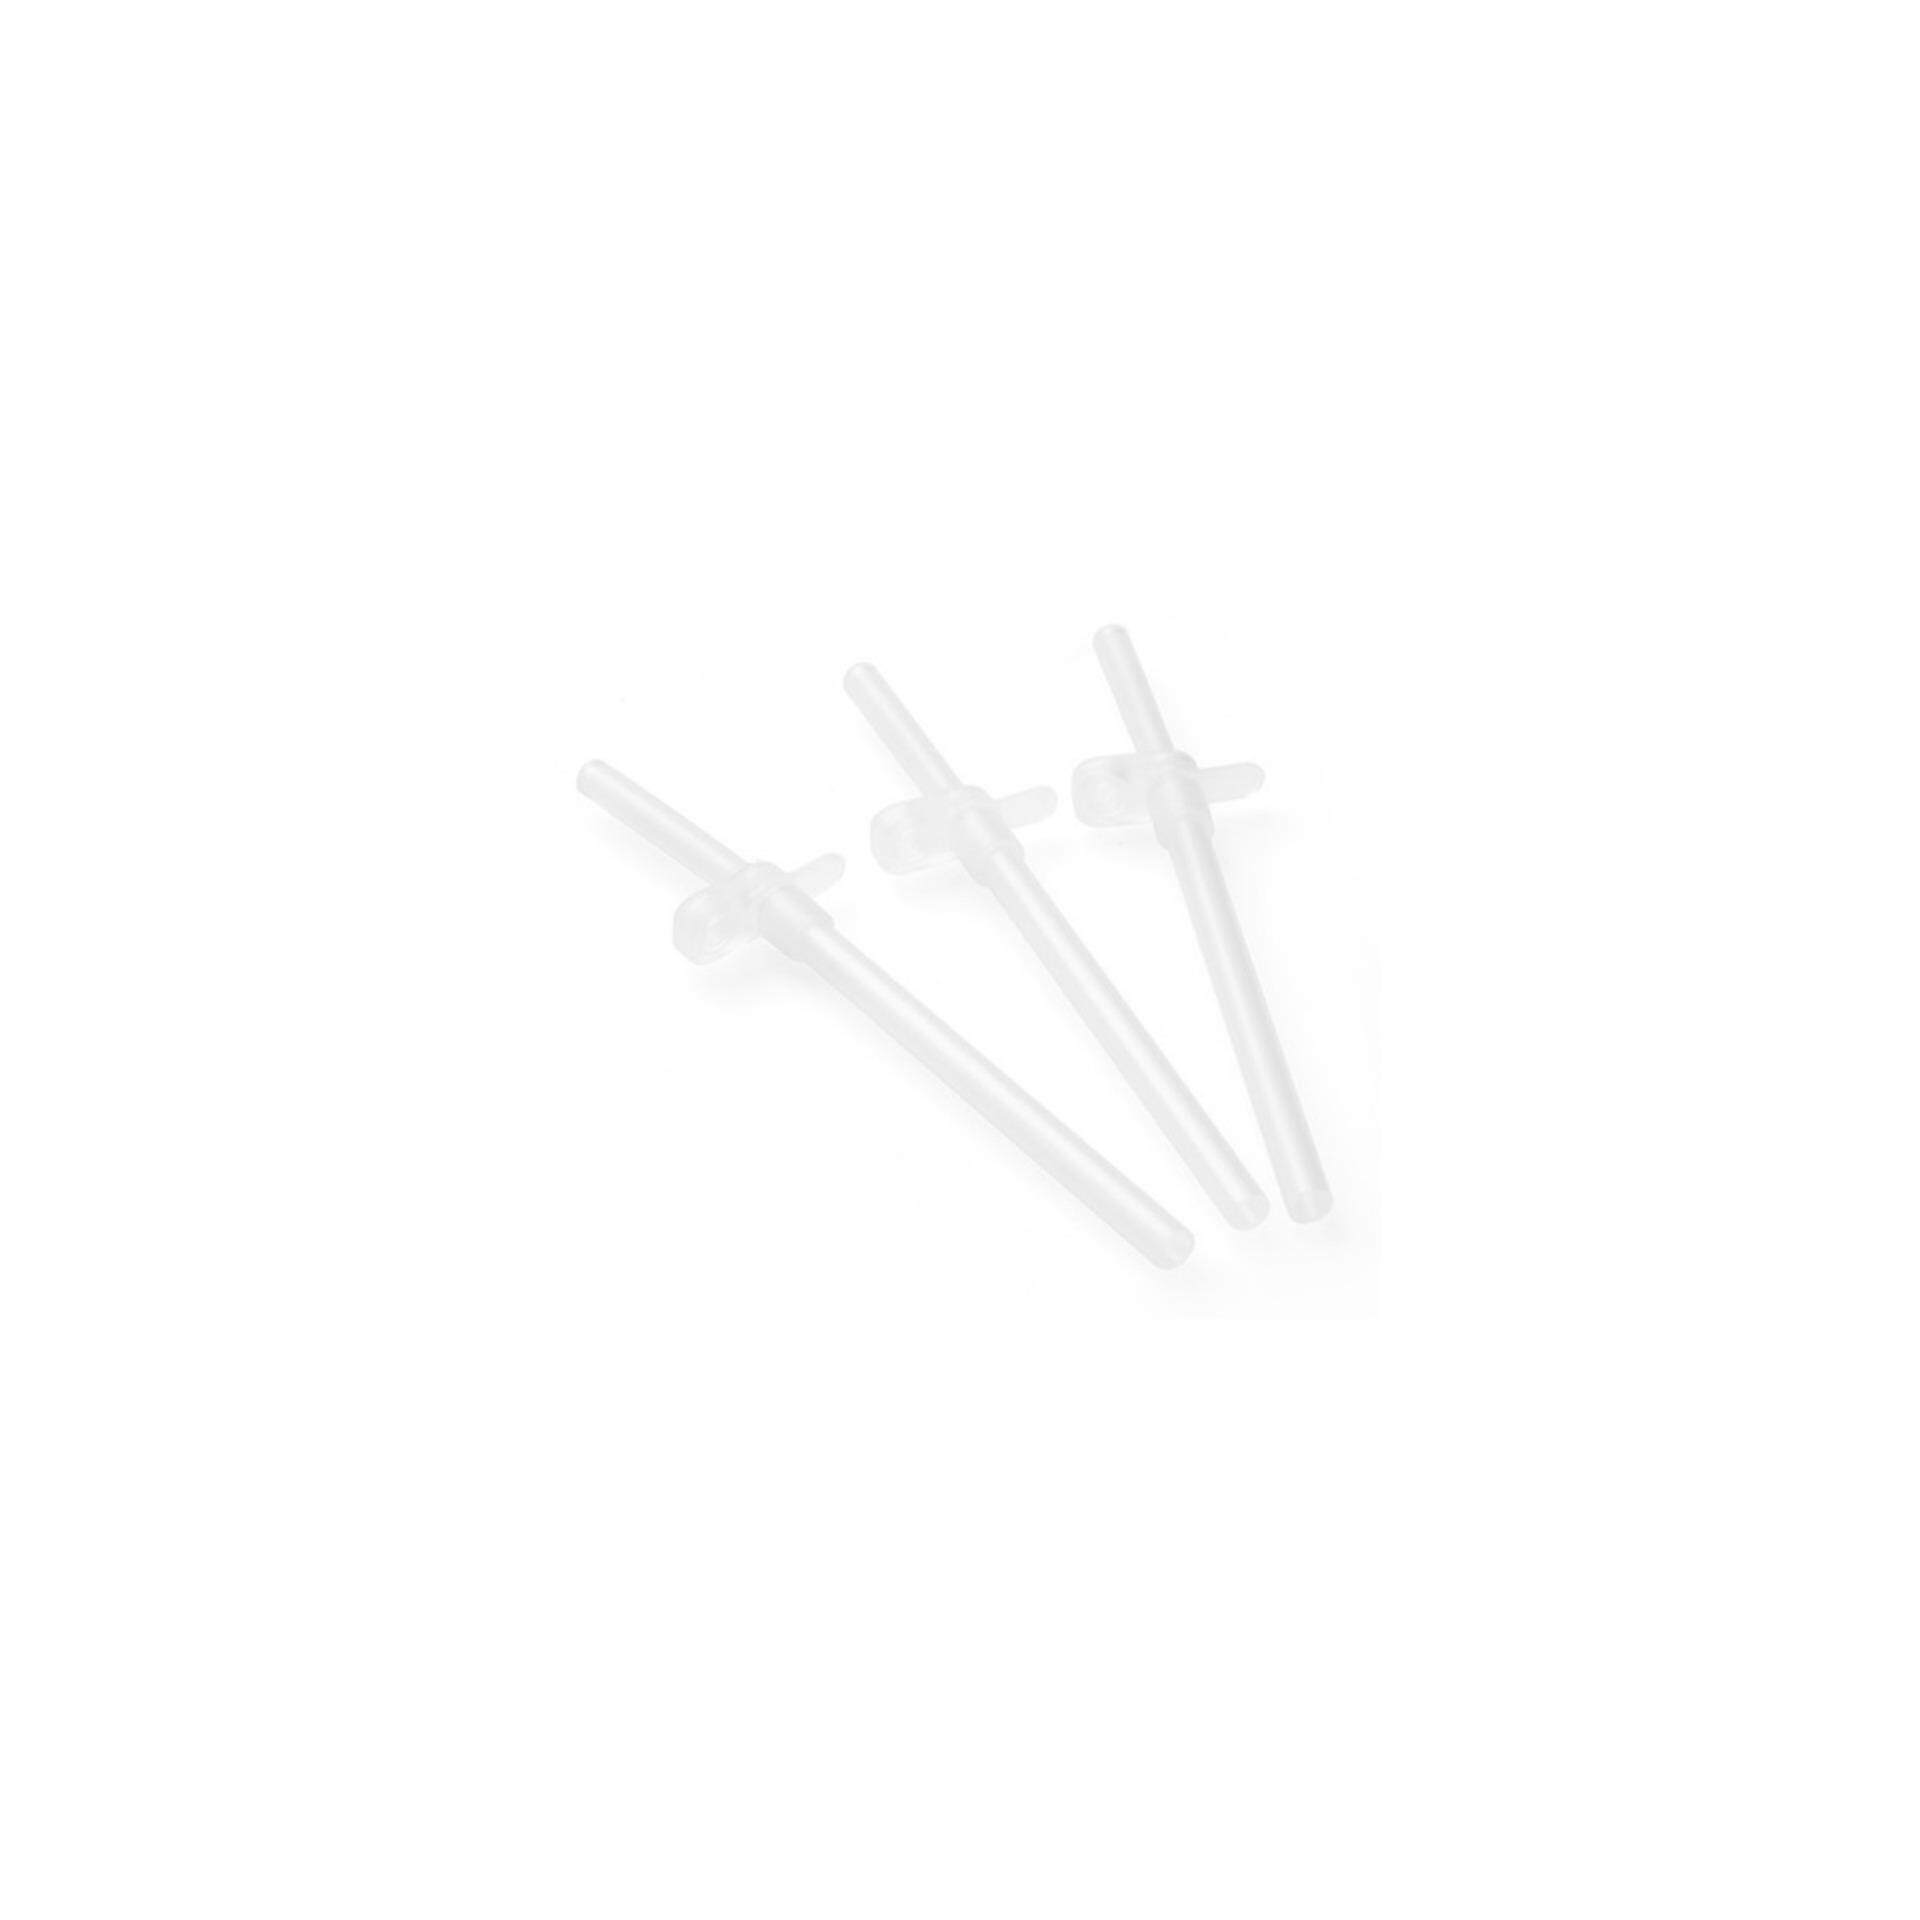 Tupperware Twinkle Straw (3)